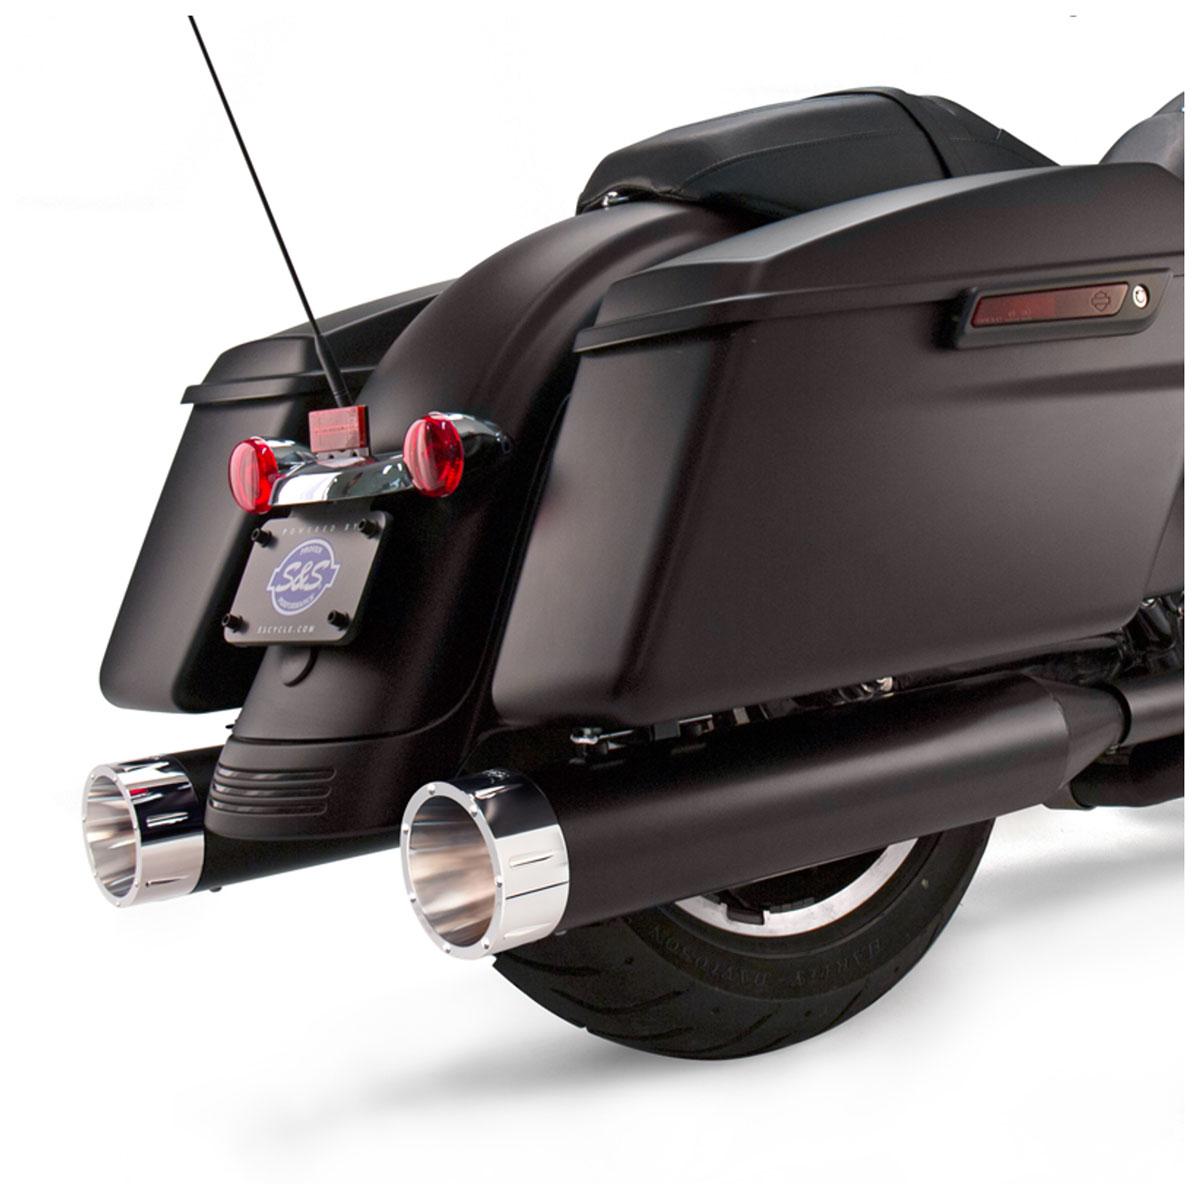 S&S Cycle MK45 4.5″ Mufflers Jet-Hot Black, Chrome Tracer End Cap